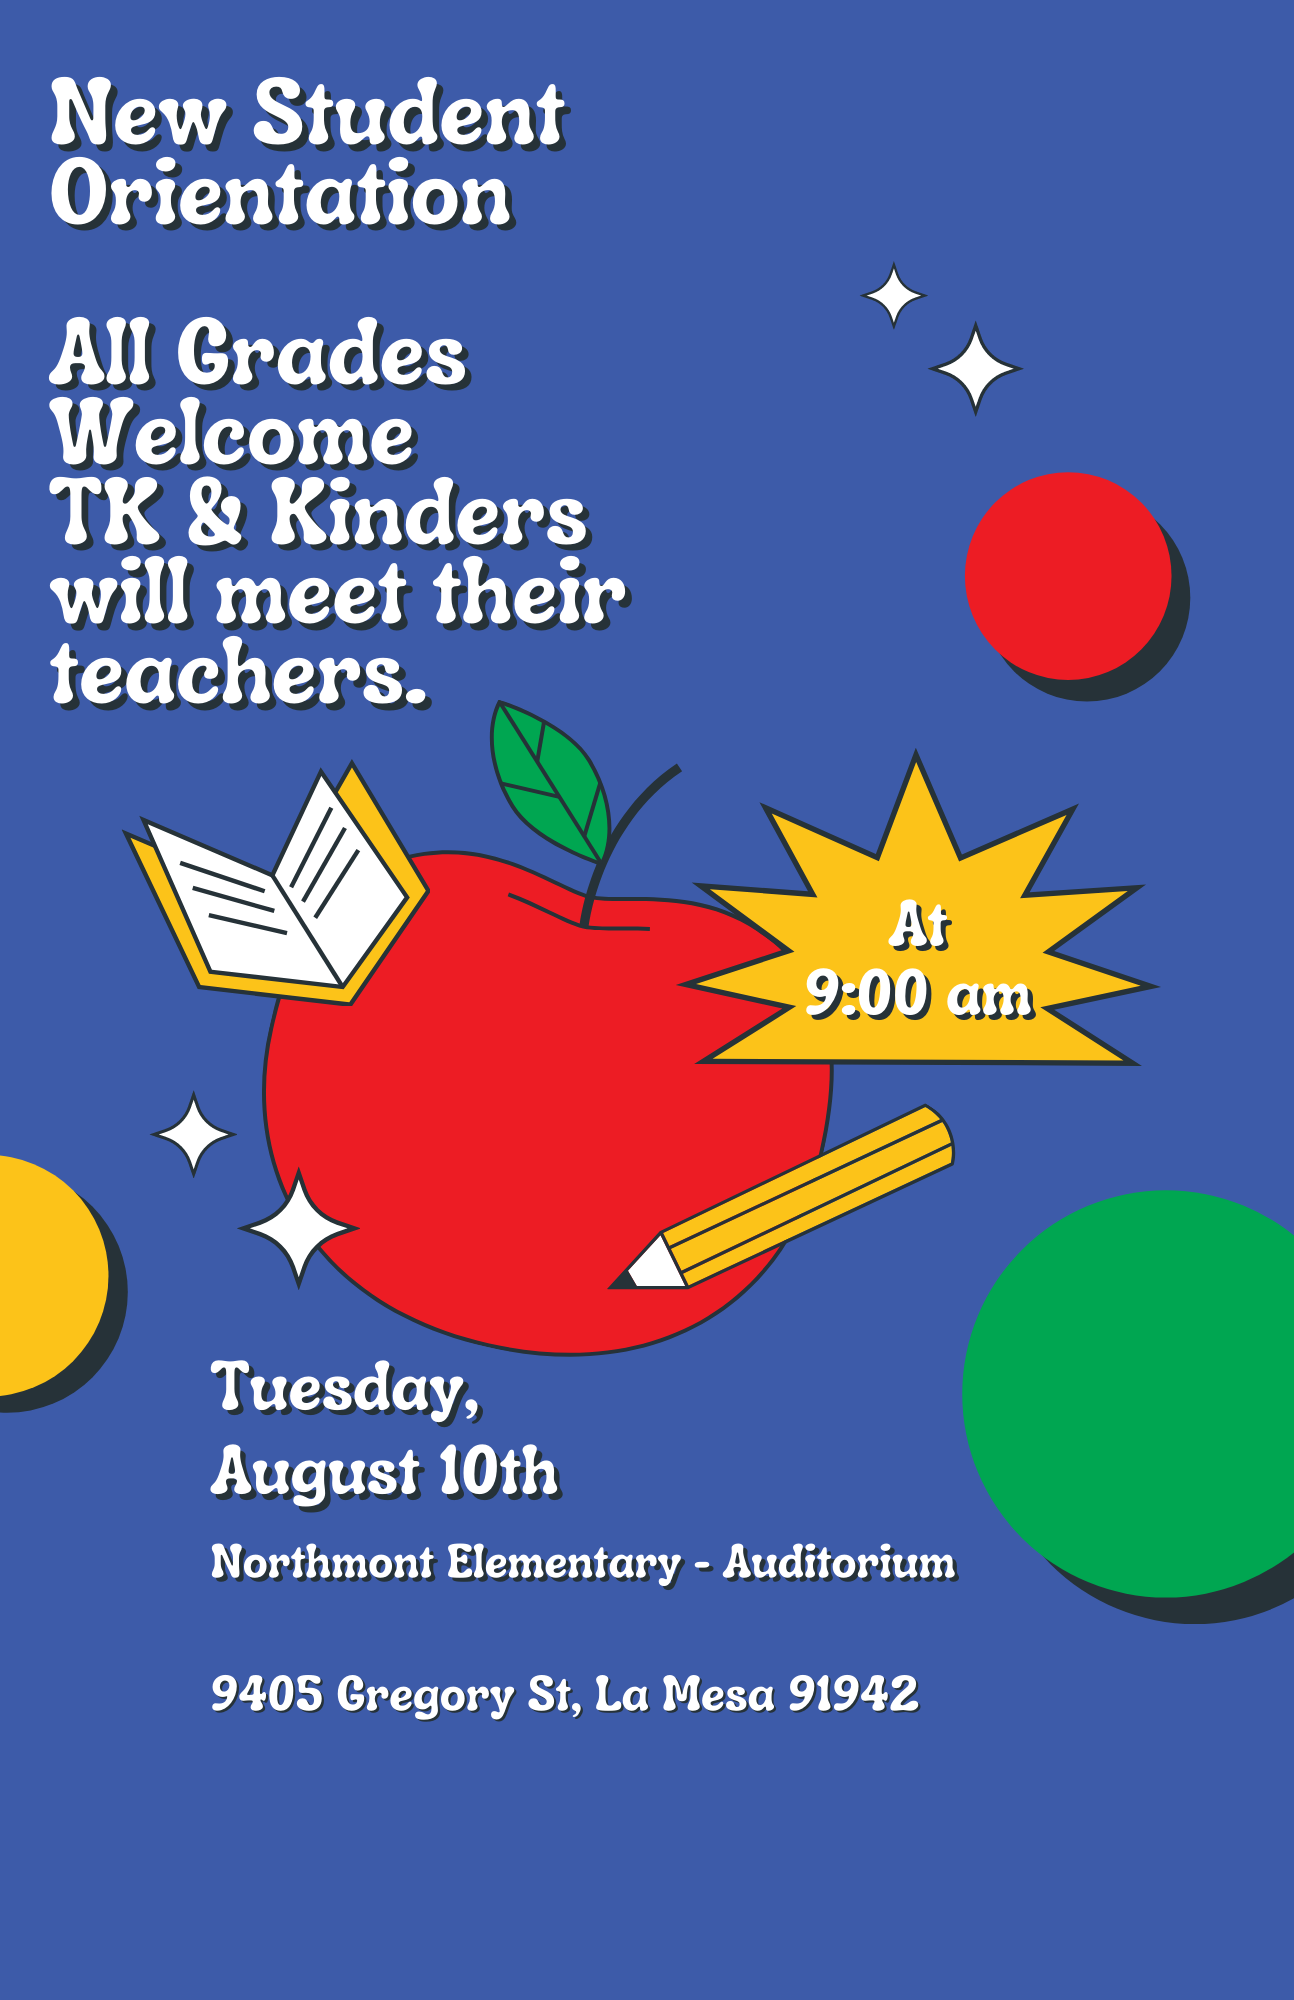 New Student Orientation Flyer